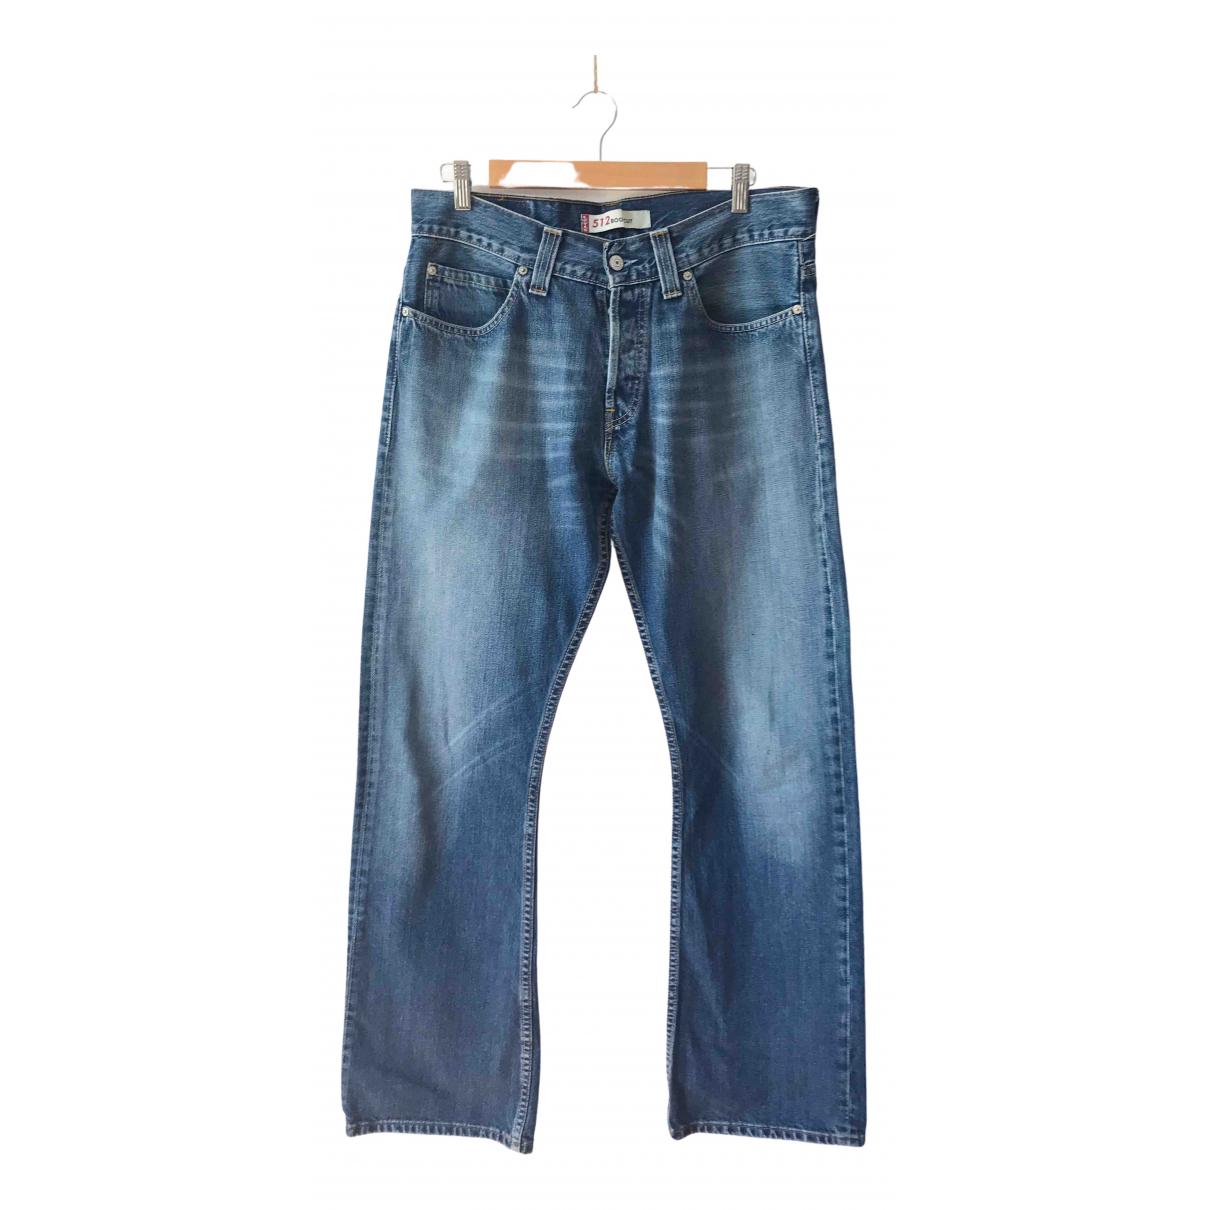 Levi's \N Blue Denim - Jeans Jeans for Women 38 FR